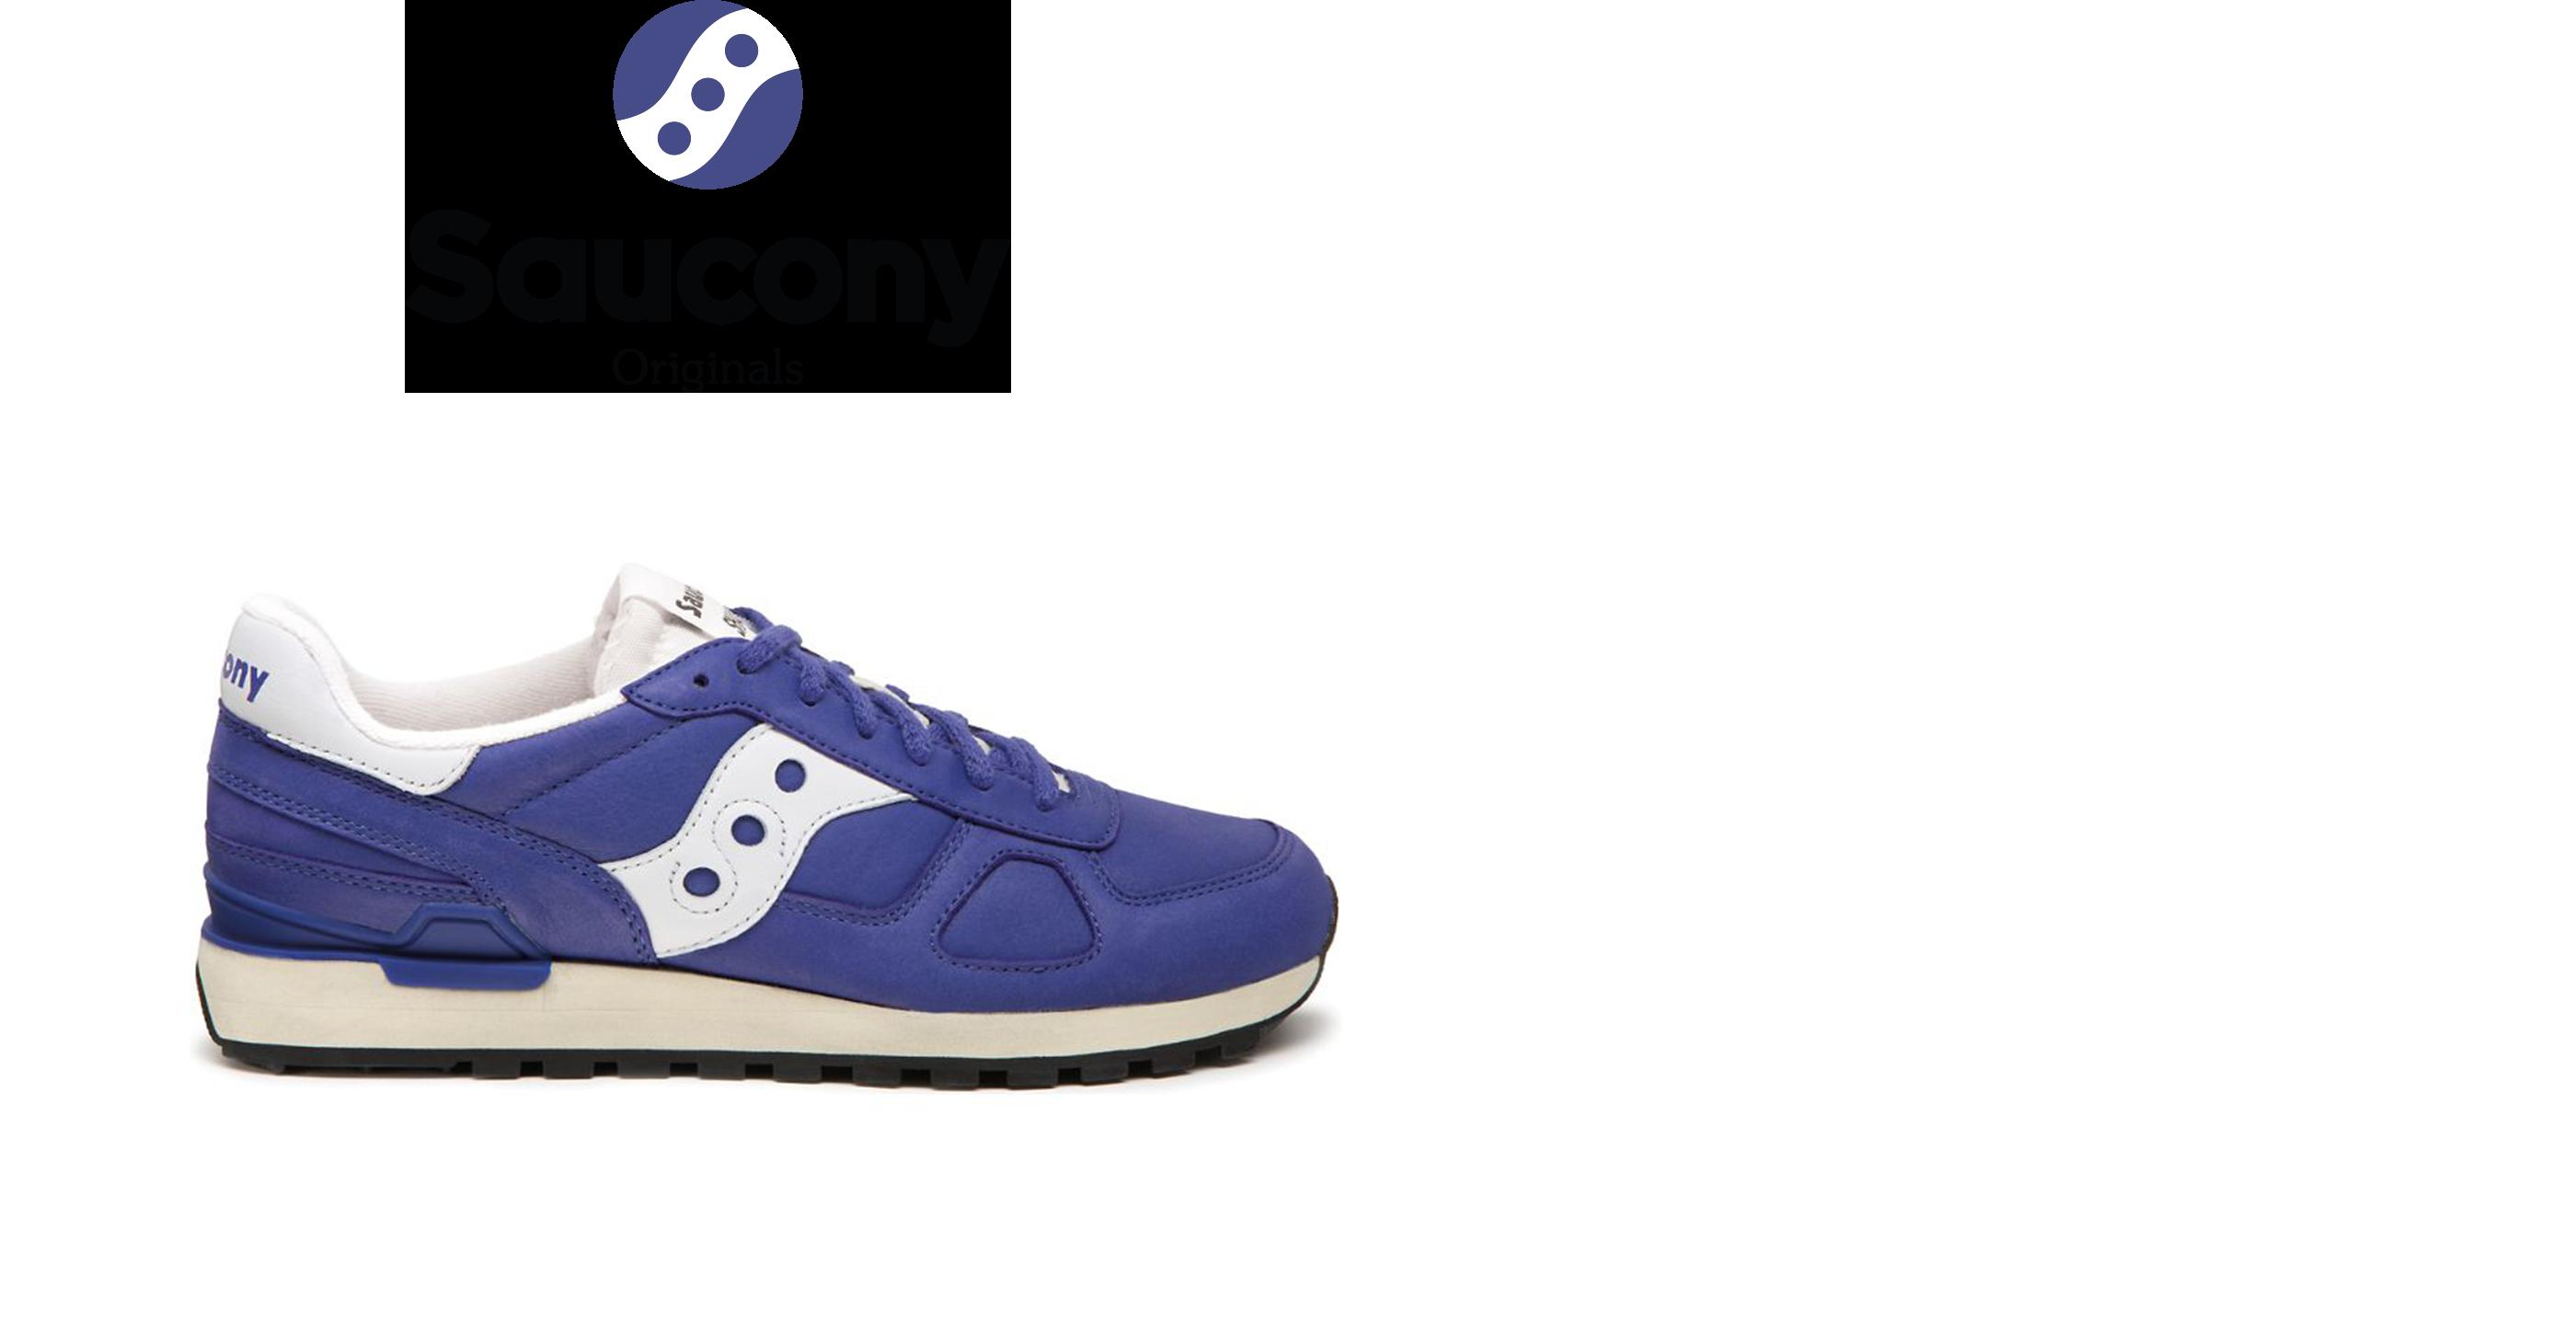 Saucony Shadow Original in Blue.